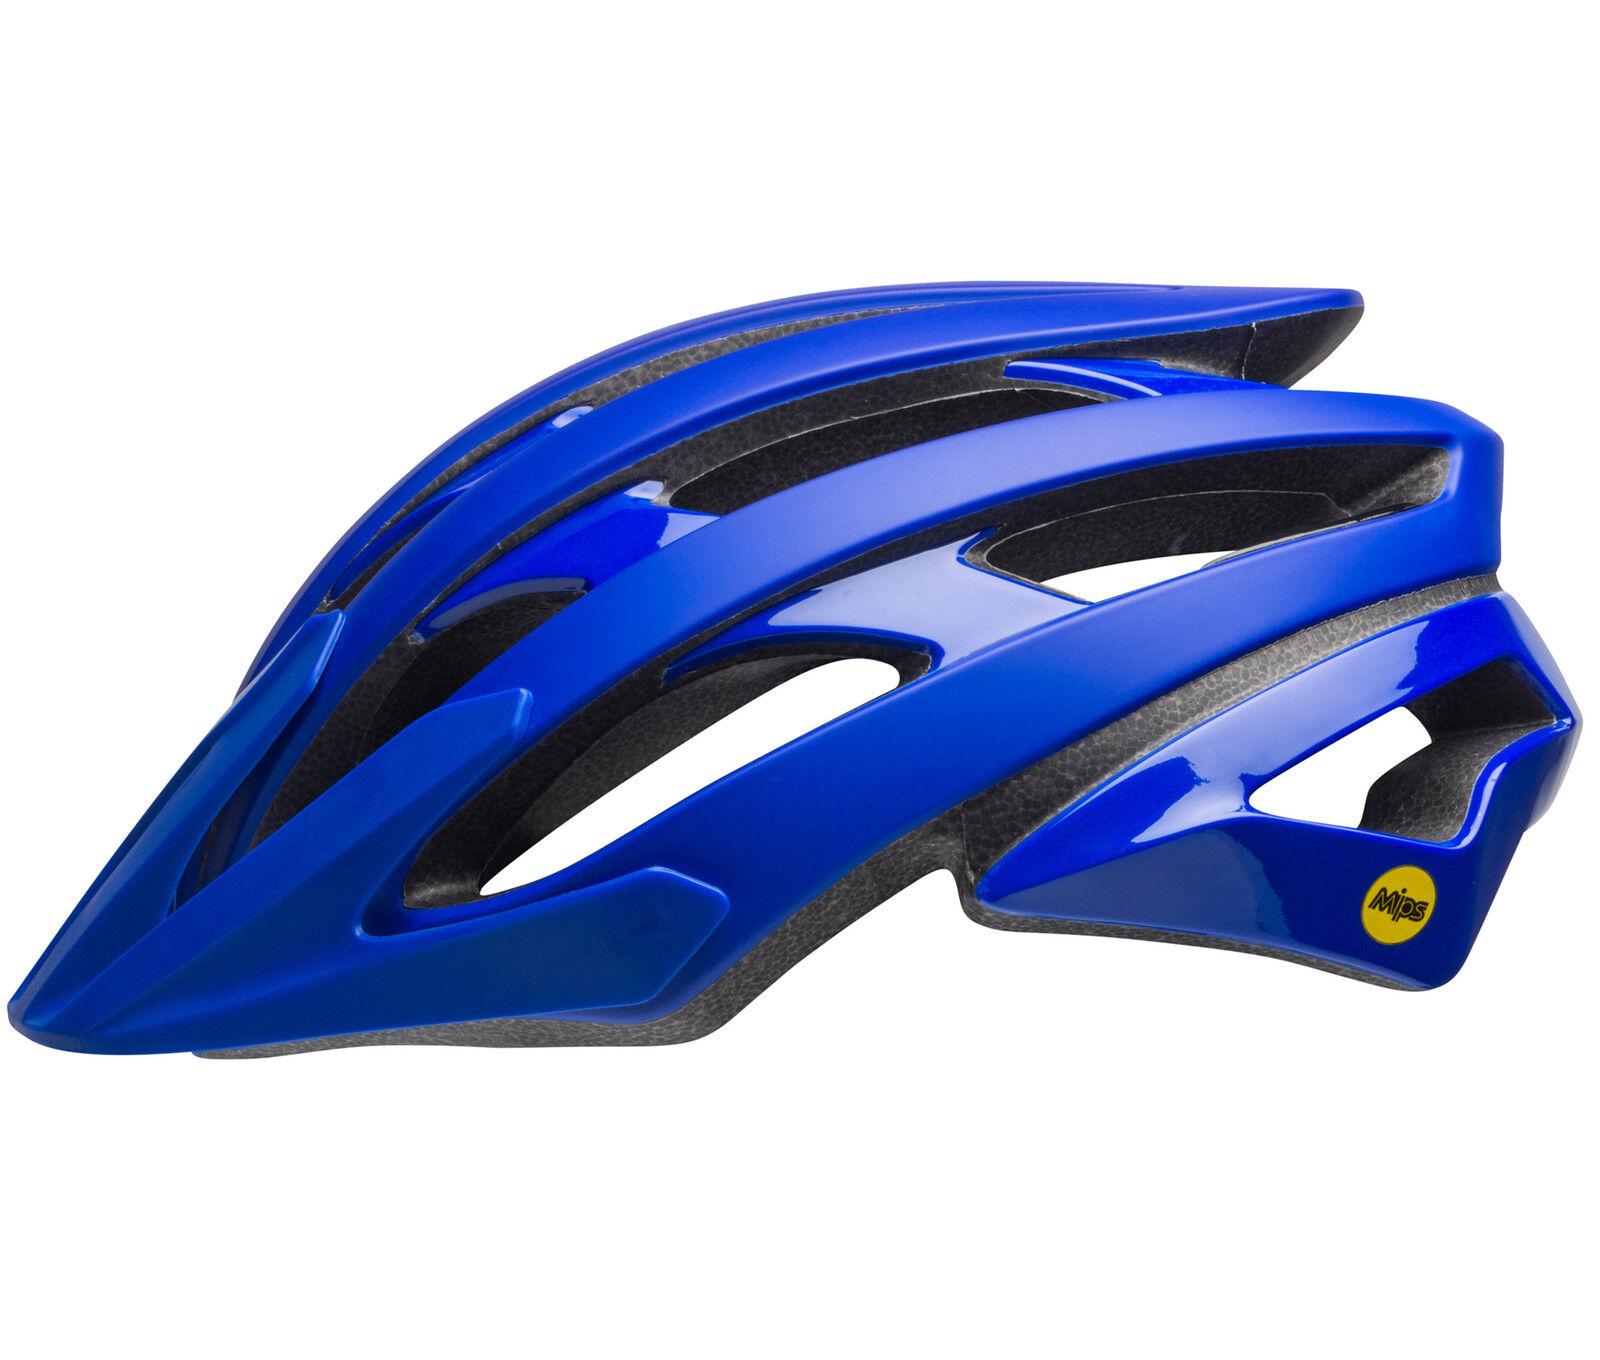 Bell Catalyst MIPS XC MTB bicicleta casco azul 2018